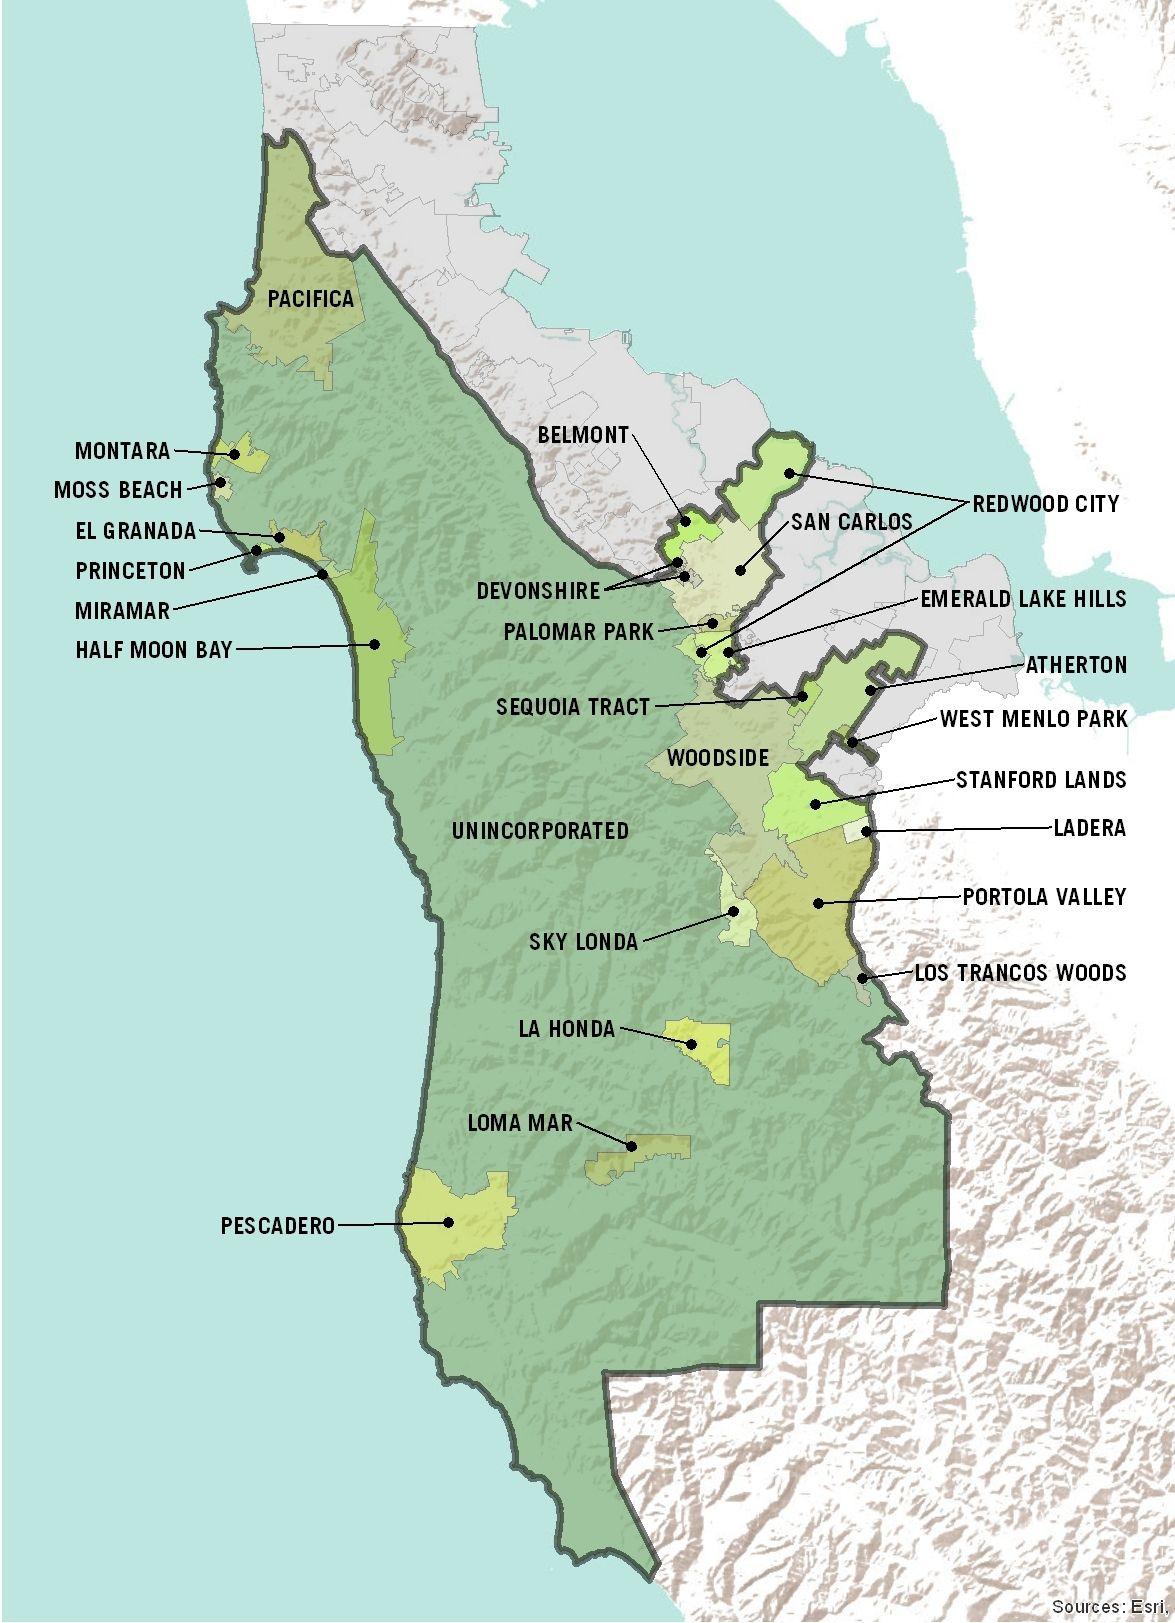 watershed map in san mateo county ca - Google Search | SF ... on imus, cavite, san lorenzo map, cainta, rizal, lucena city, santa cruz ca area map, alameda island map, la costa valley map, san buenaventura map, antipolo city, santa clara map, mt. san antonio map, bacoor, cavite, cardona, rizal, baras, rizal, san fran map, redwood city map, morong, rizal, san pedro ca map, rodriguez, rizal, san tomas map, tanay, rizal, san pablo map, taytay, rizal, california map, fortuna ca street map, carmel drive pacifica ca map, tanza, cavite, contra costa county map, san martin map, jala-jala, rizal, san miguel map, bay area map,